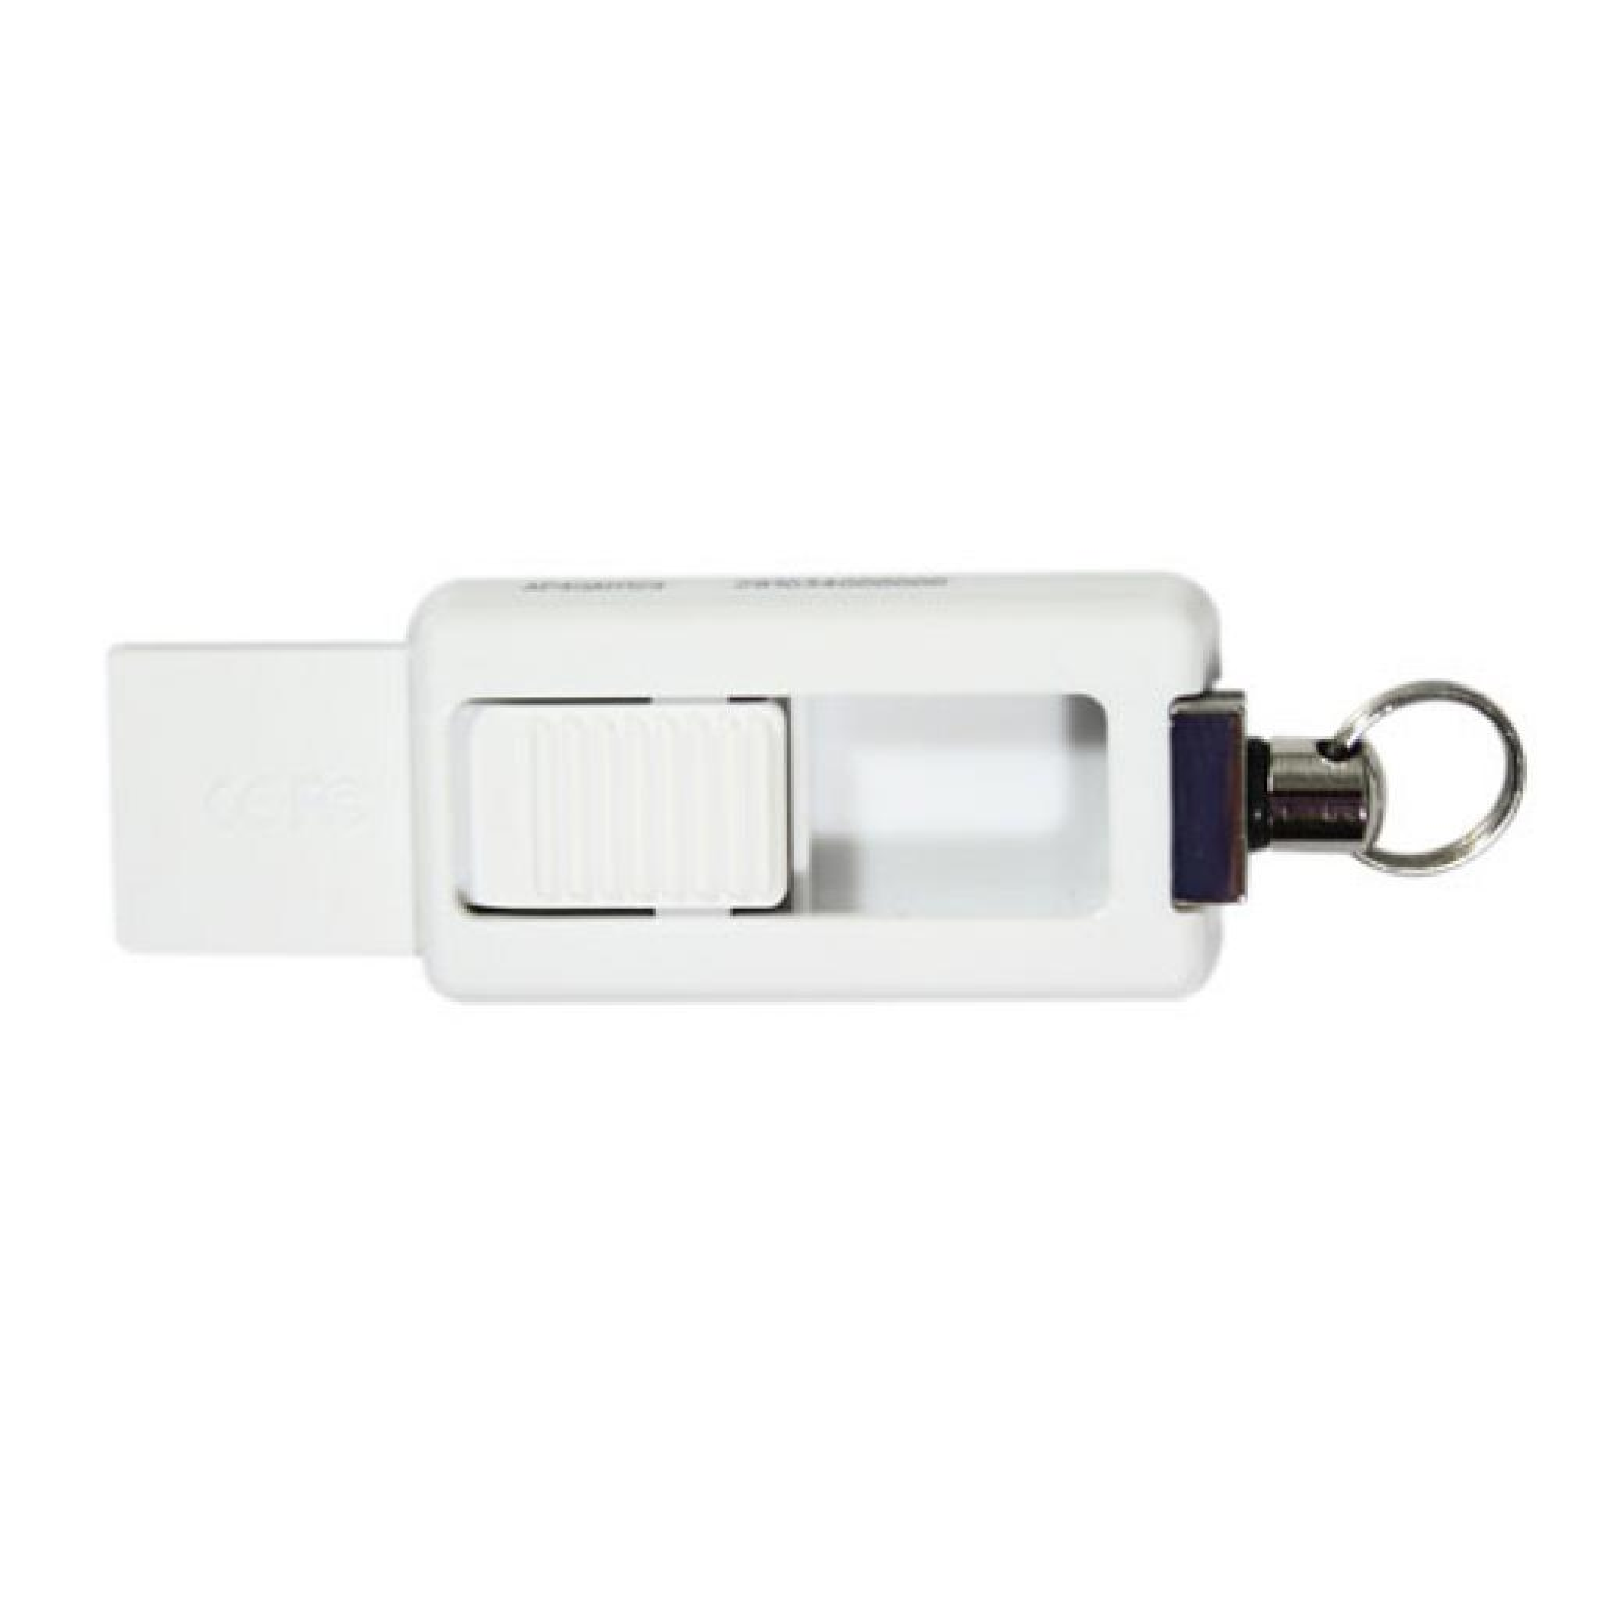 USB флеш накопитель 32GB AH129 Silver RP USB2.0 Apacer (AP32GAH129S-1) изображение 3